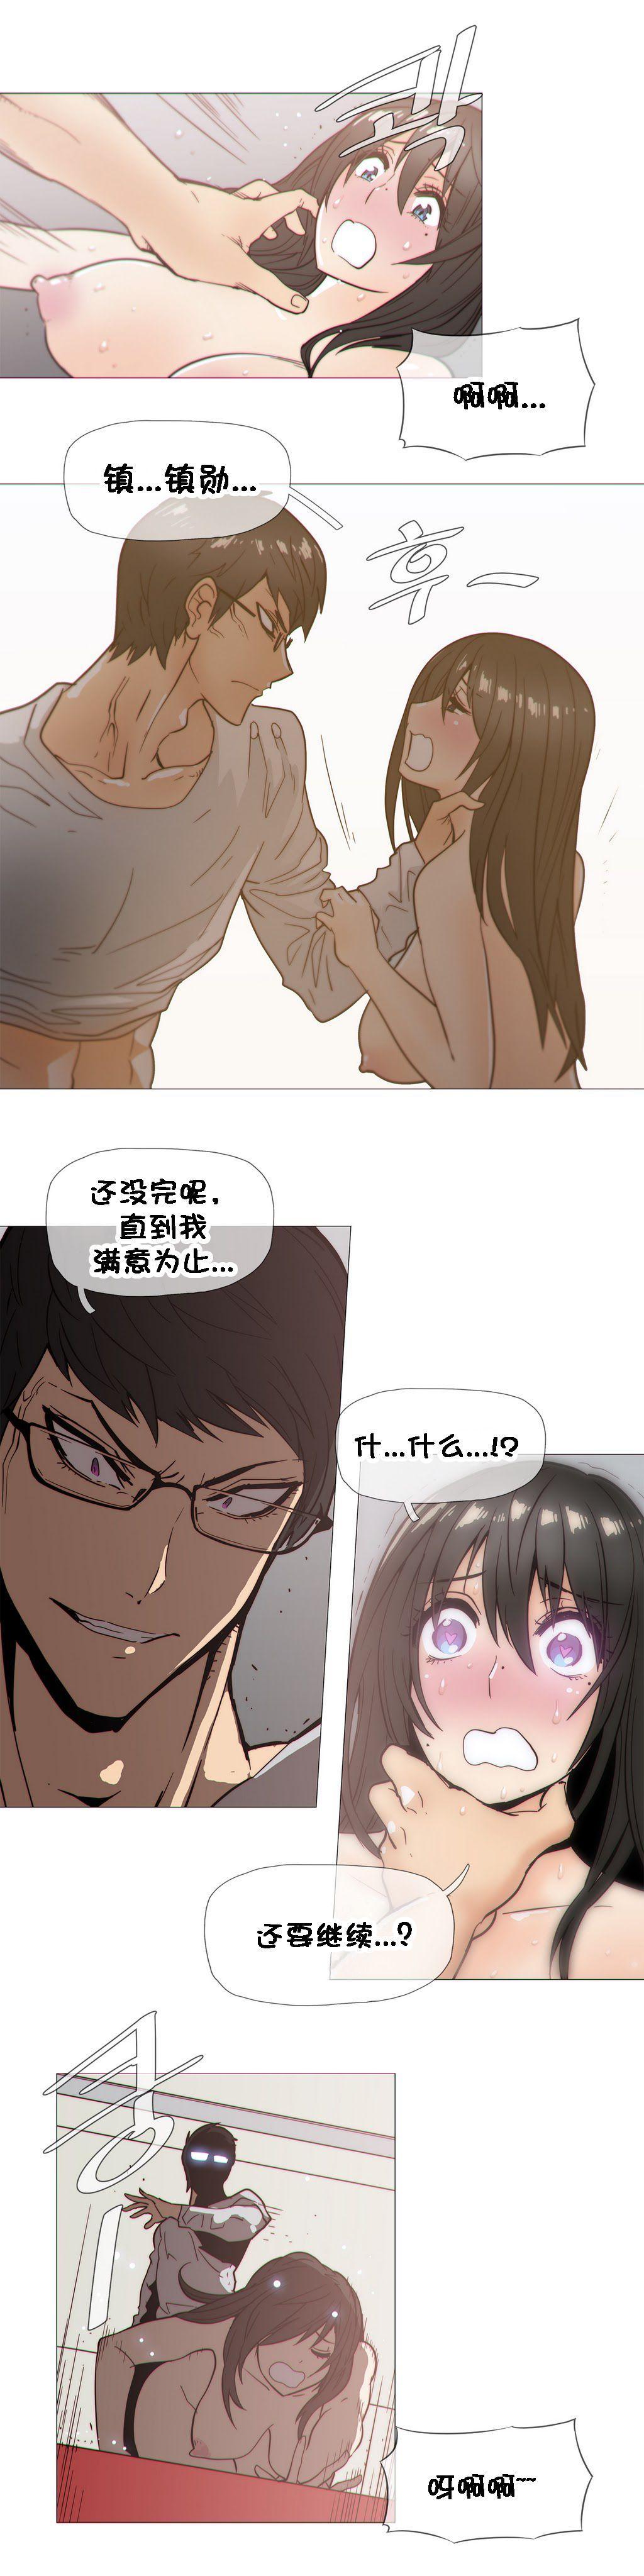 HouseHold Affairs 【卞赤鲤个人汉化】1~33话(持续更新中) 622